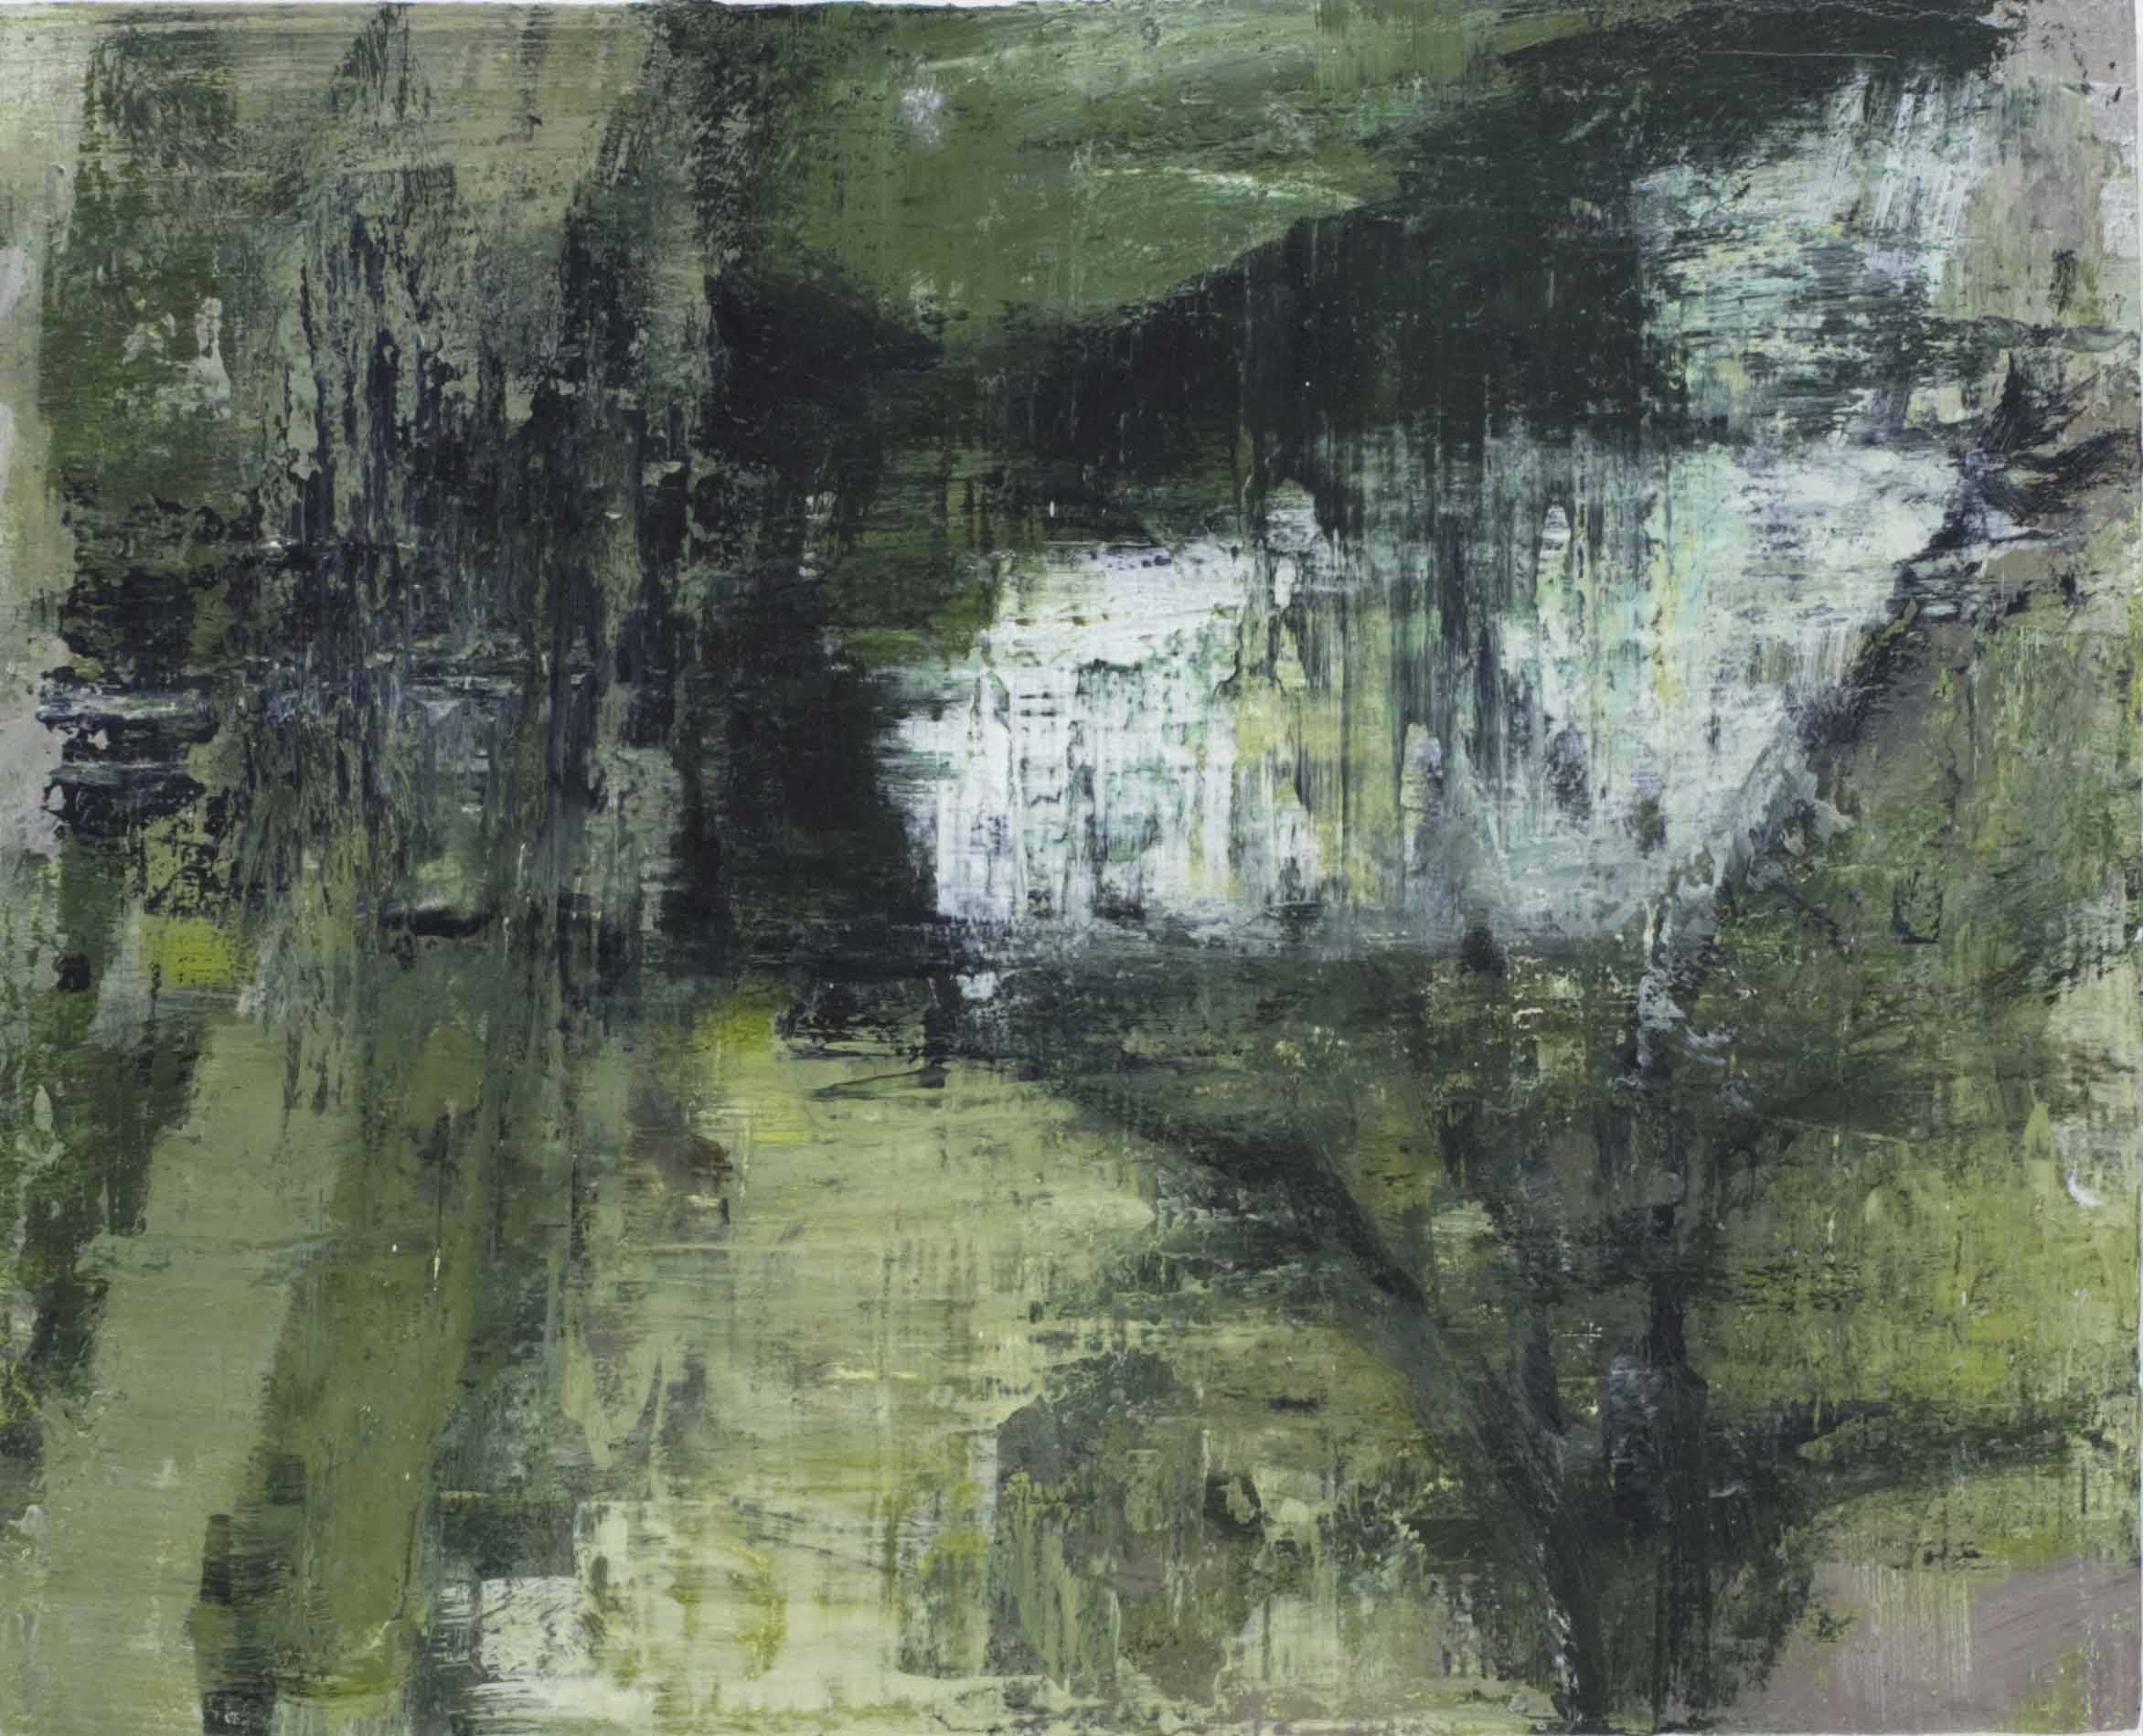 Joanna Logue, Garden , 2016, acrylic on board, 30 x 40cm